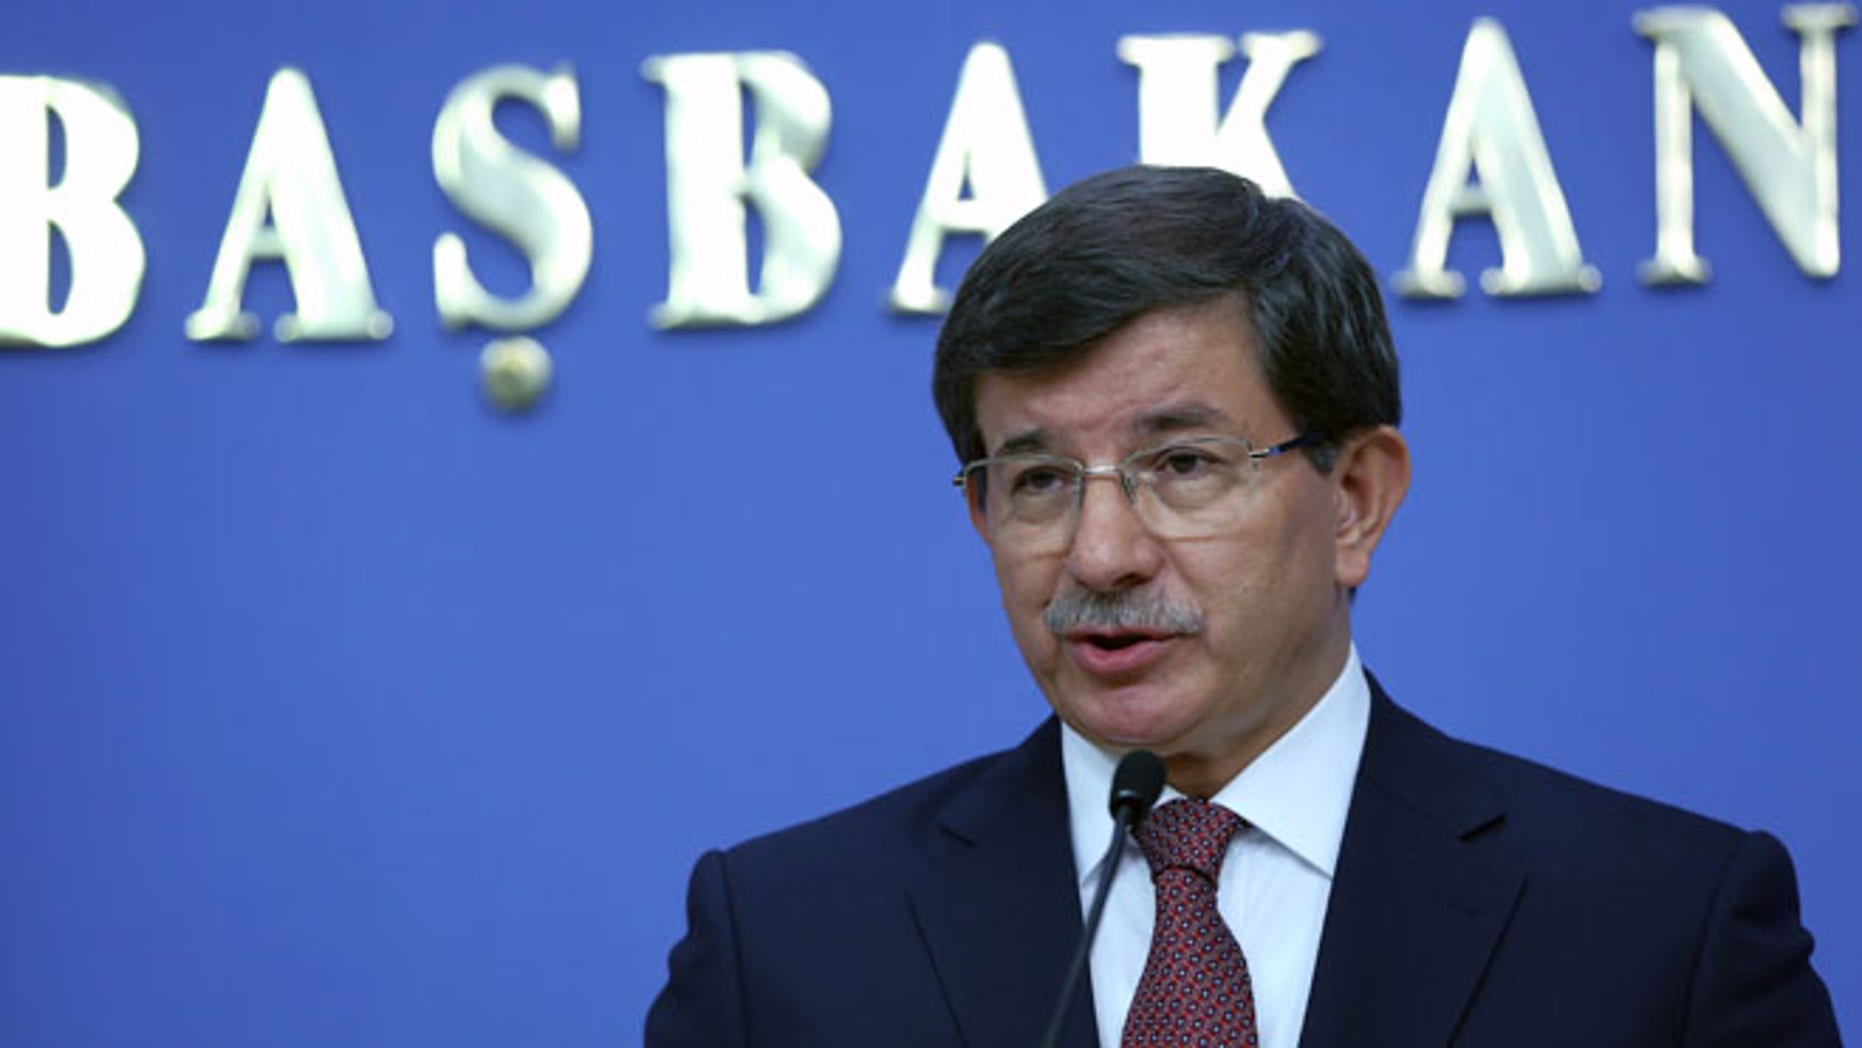 Aug. 29, 2014: Turkey's new Prime Minister Ahmet Davutoglu announces his cabinet ministers in Ankara, Turkey.